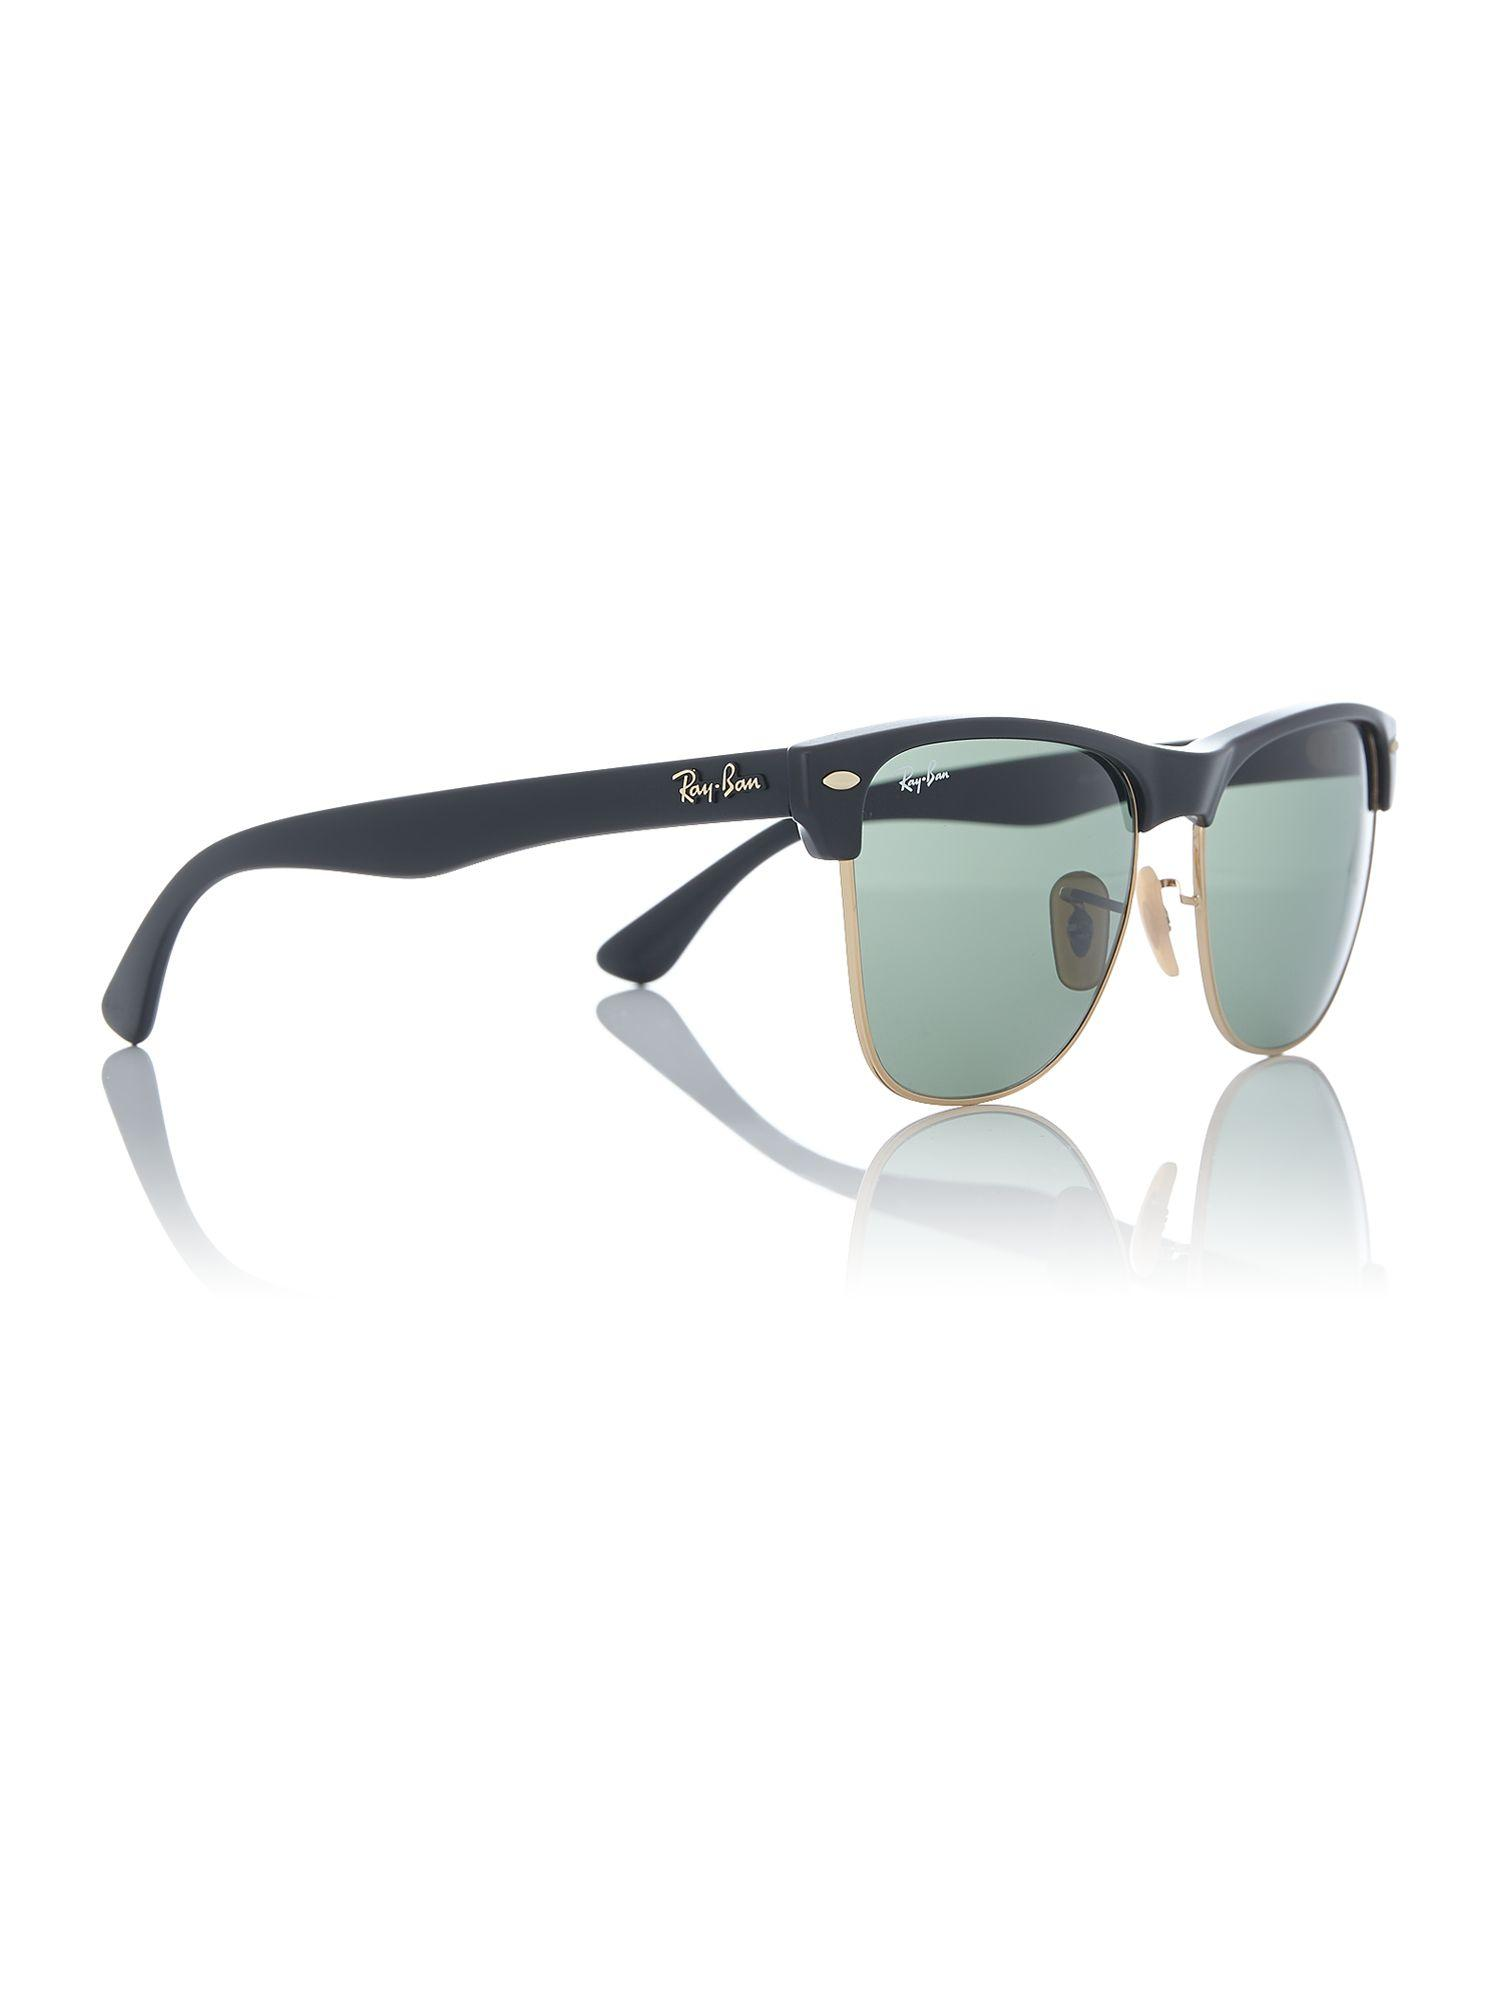 5797e360b7 Ray Ban Clubmaster Glasses Boots « Heritage Malta